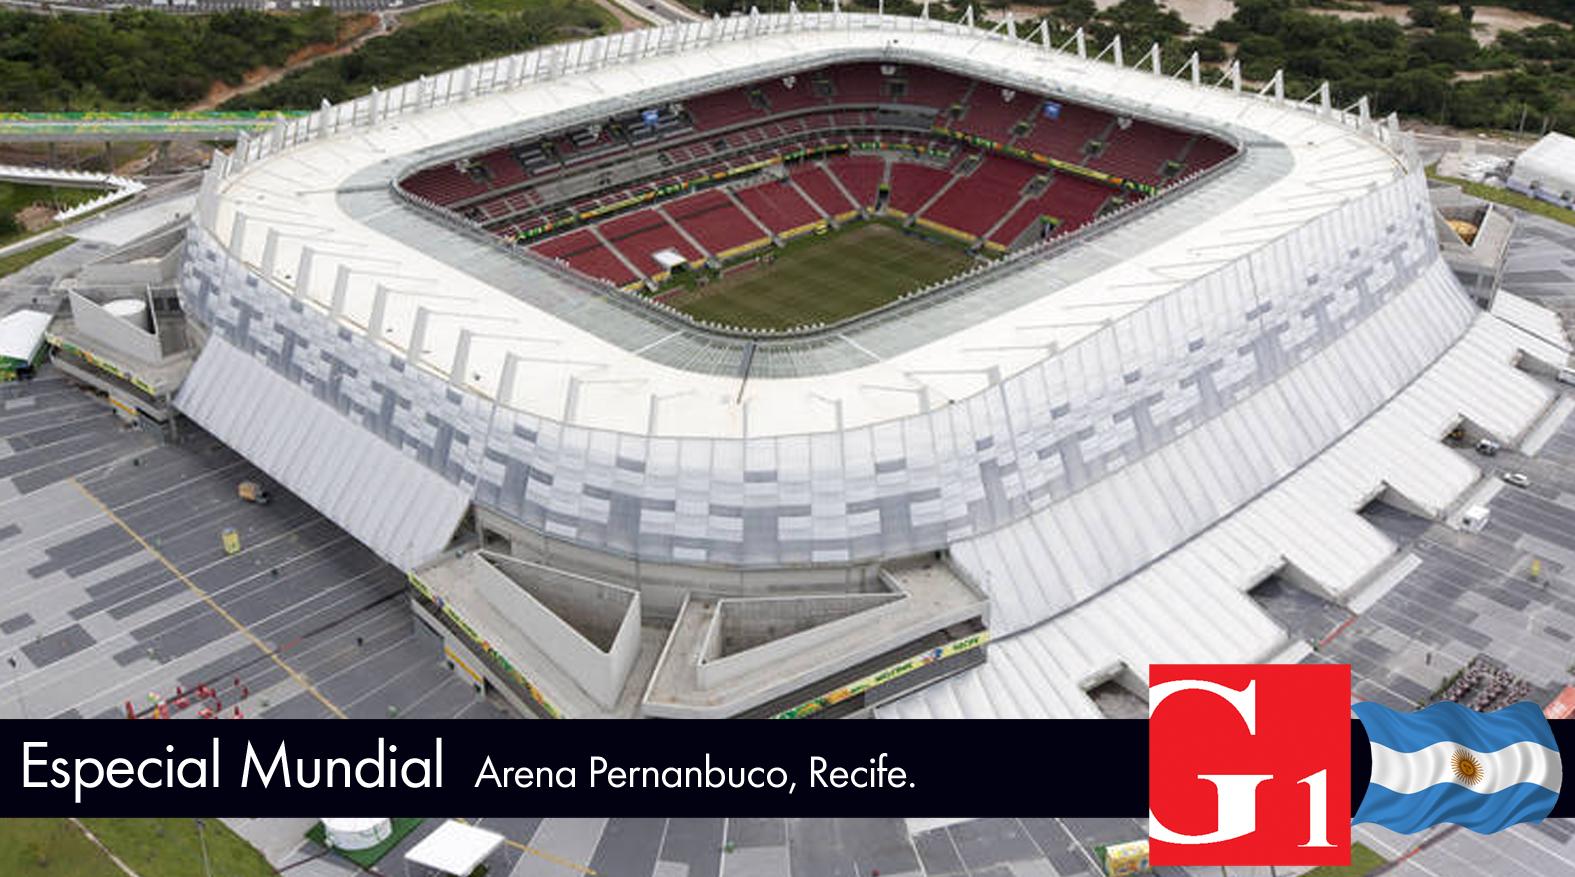 Estadio Arena Pernanbuco Recife - 1575x877